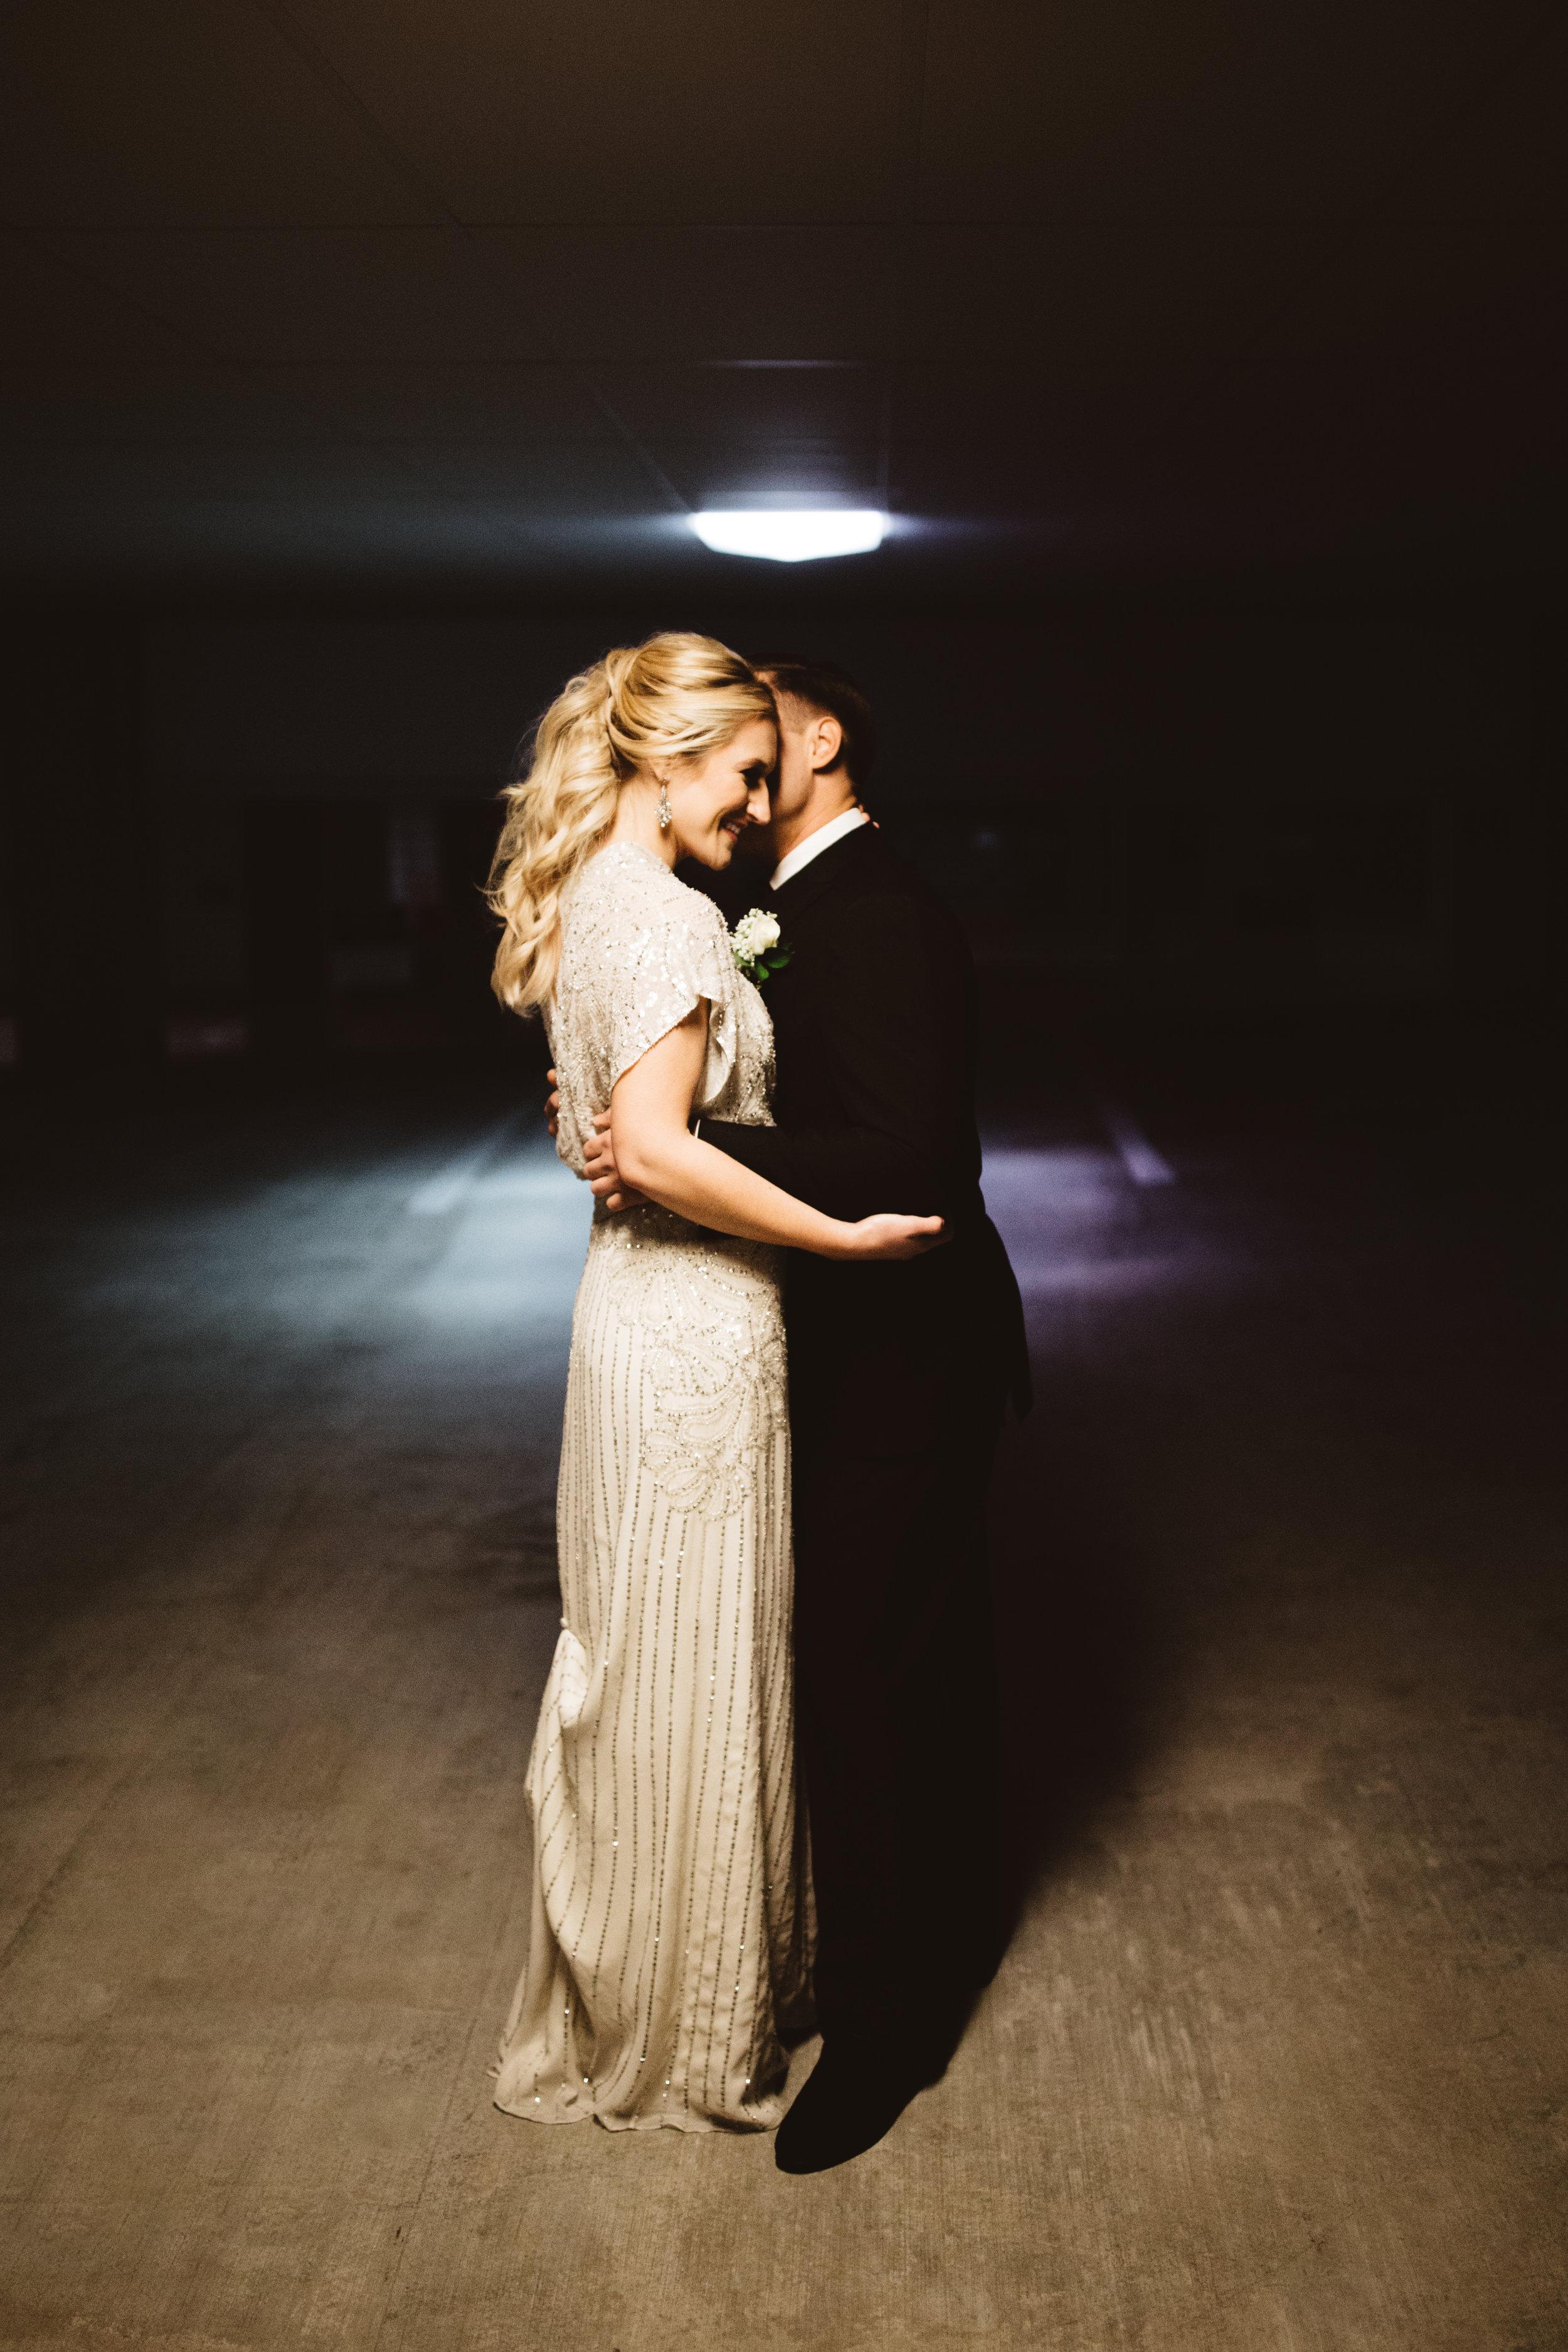 Mattie Bell Photography- Kelly & Zack Wedding Atlanta Brewery -239.jpg